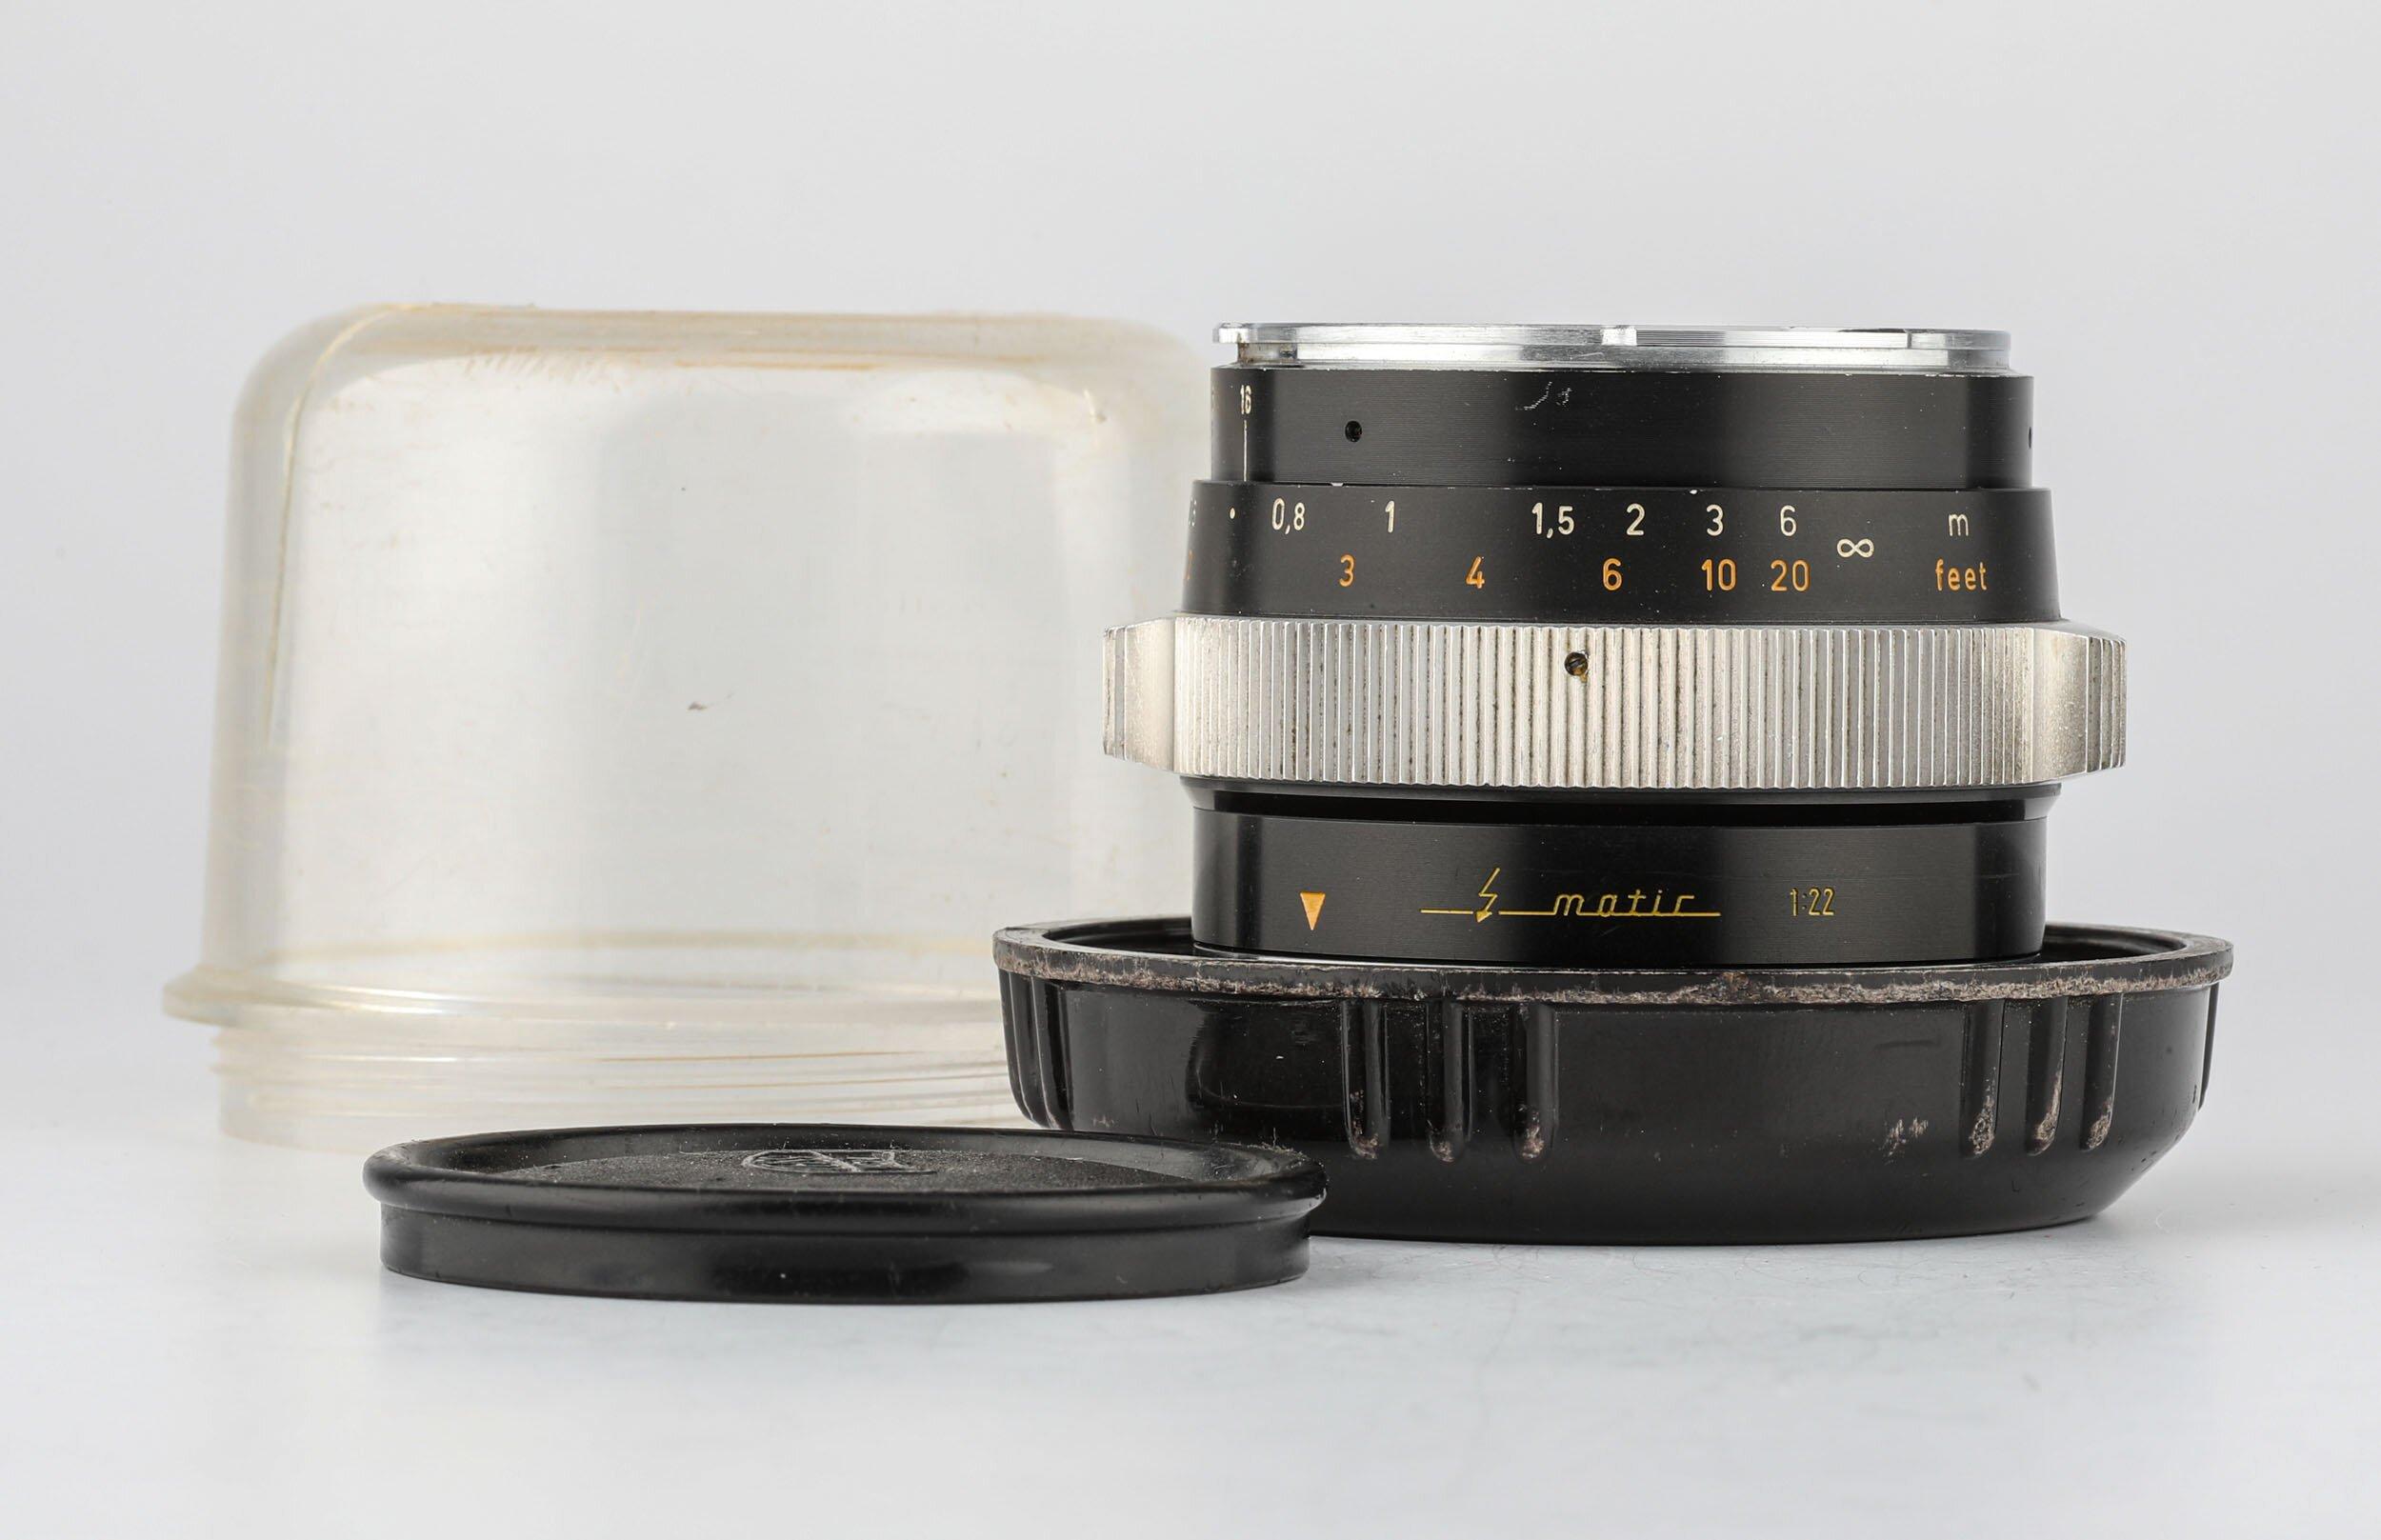 Carl Zeiss f.Contarex Distagon 4/35mm